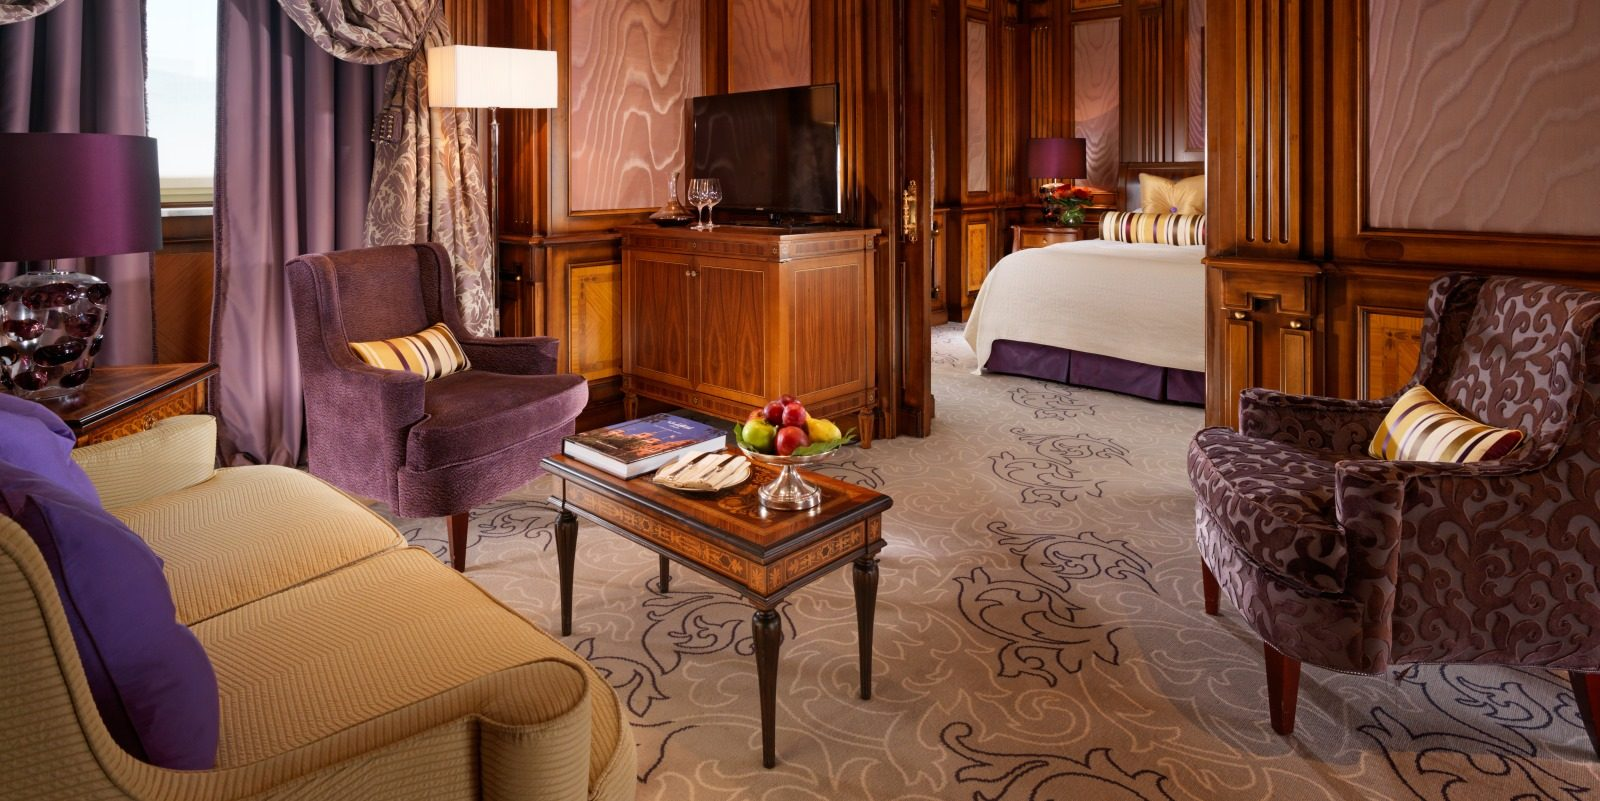 Hotel Principe di Savoia, Truffle hunting experience, Junior Suite